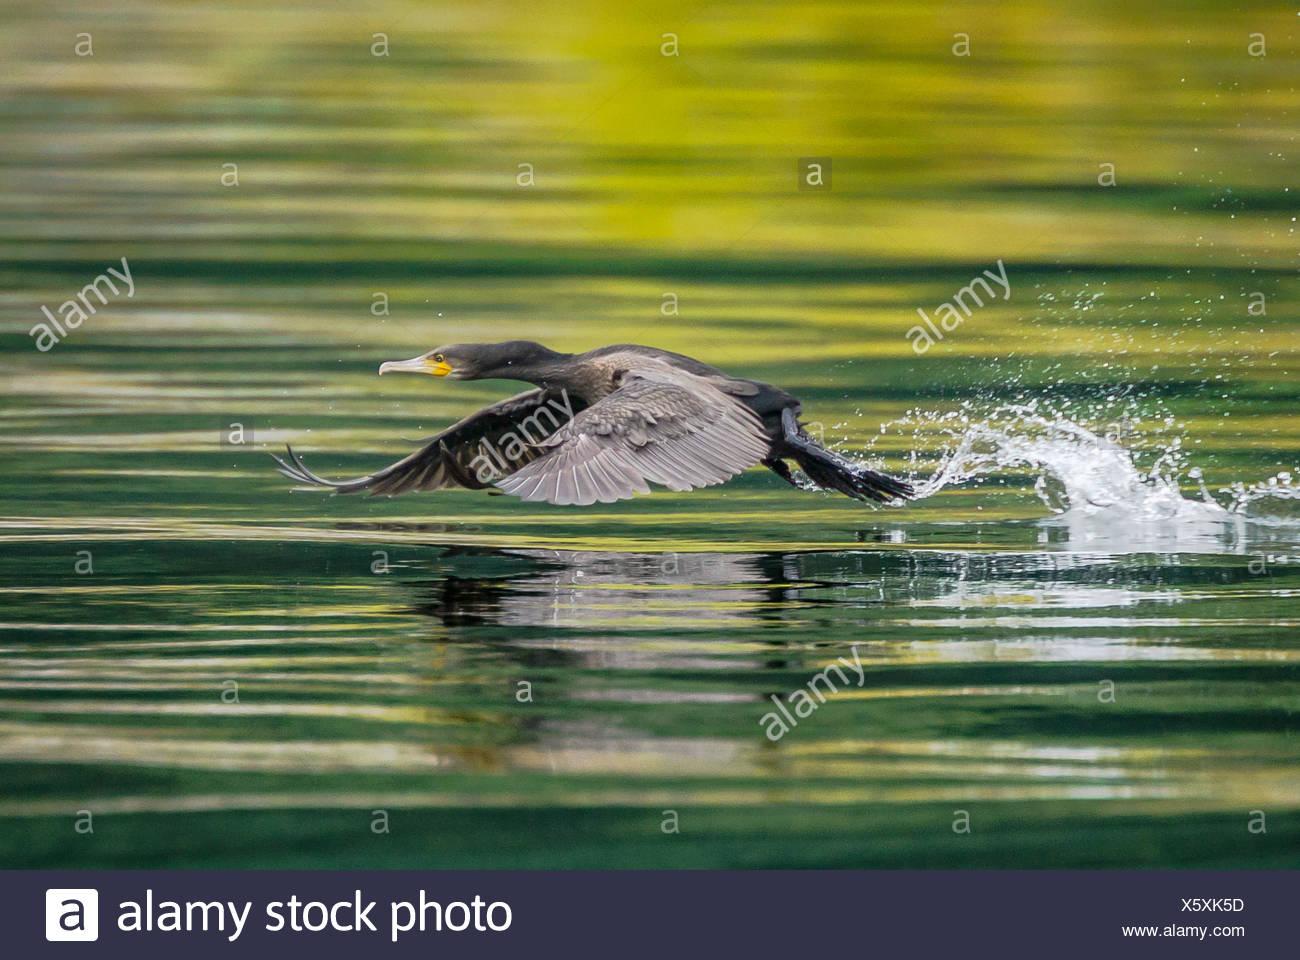 Pájaro volando a baja altura sobre el agua Imagen De Stock